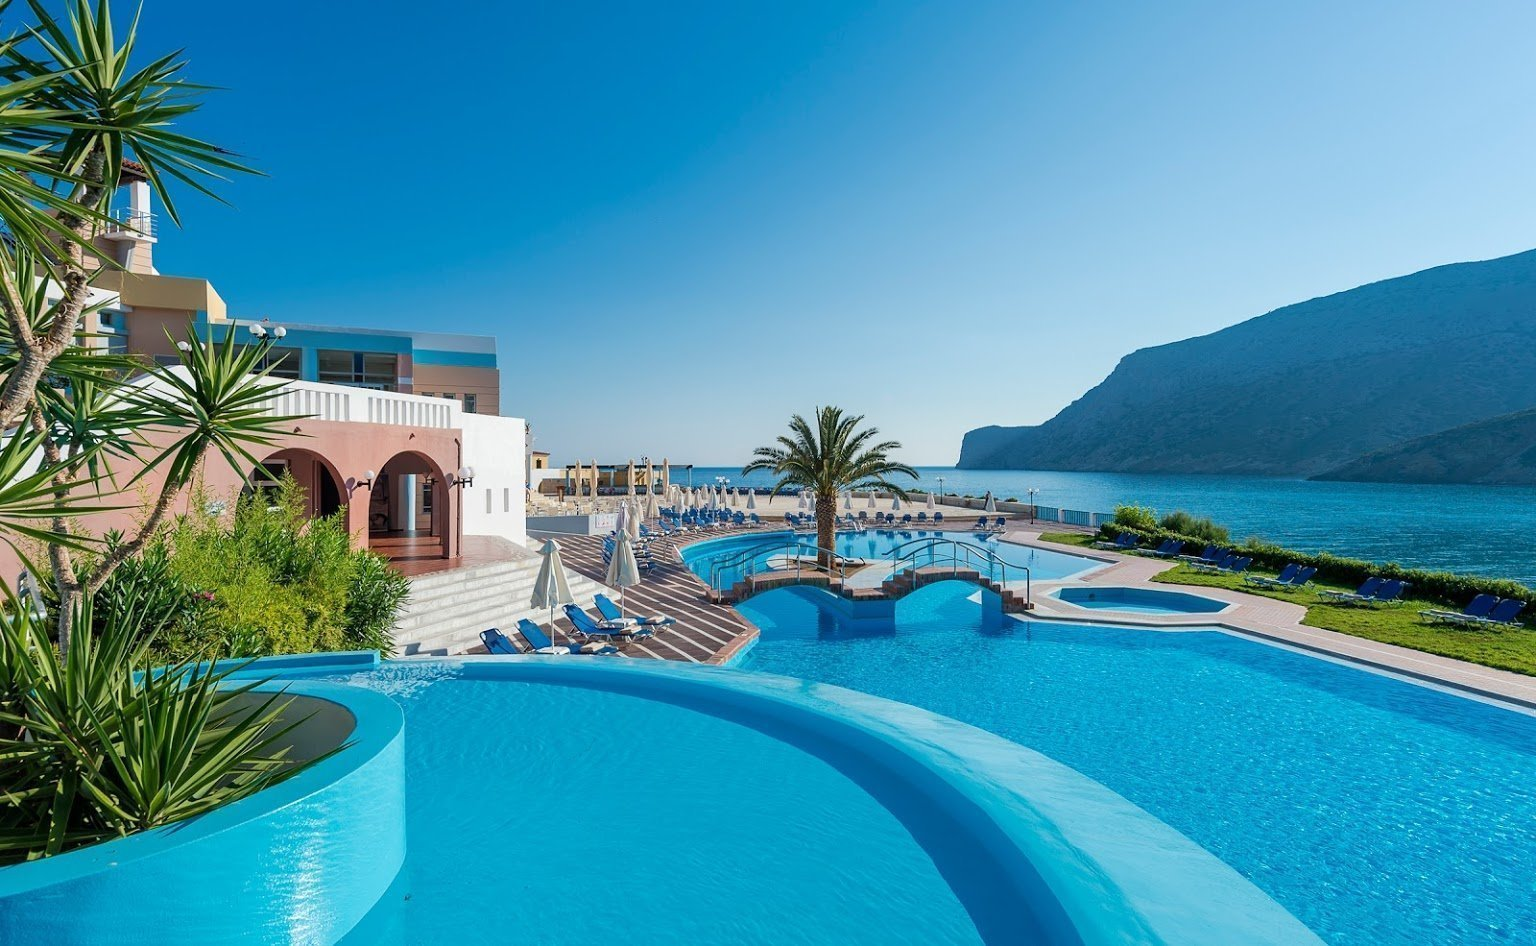 fodele_beach_resort_5